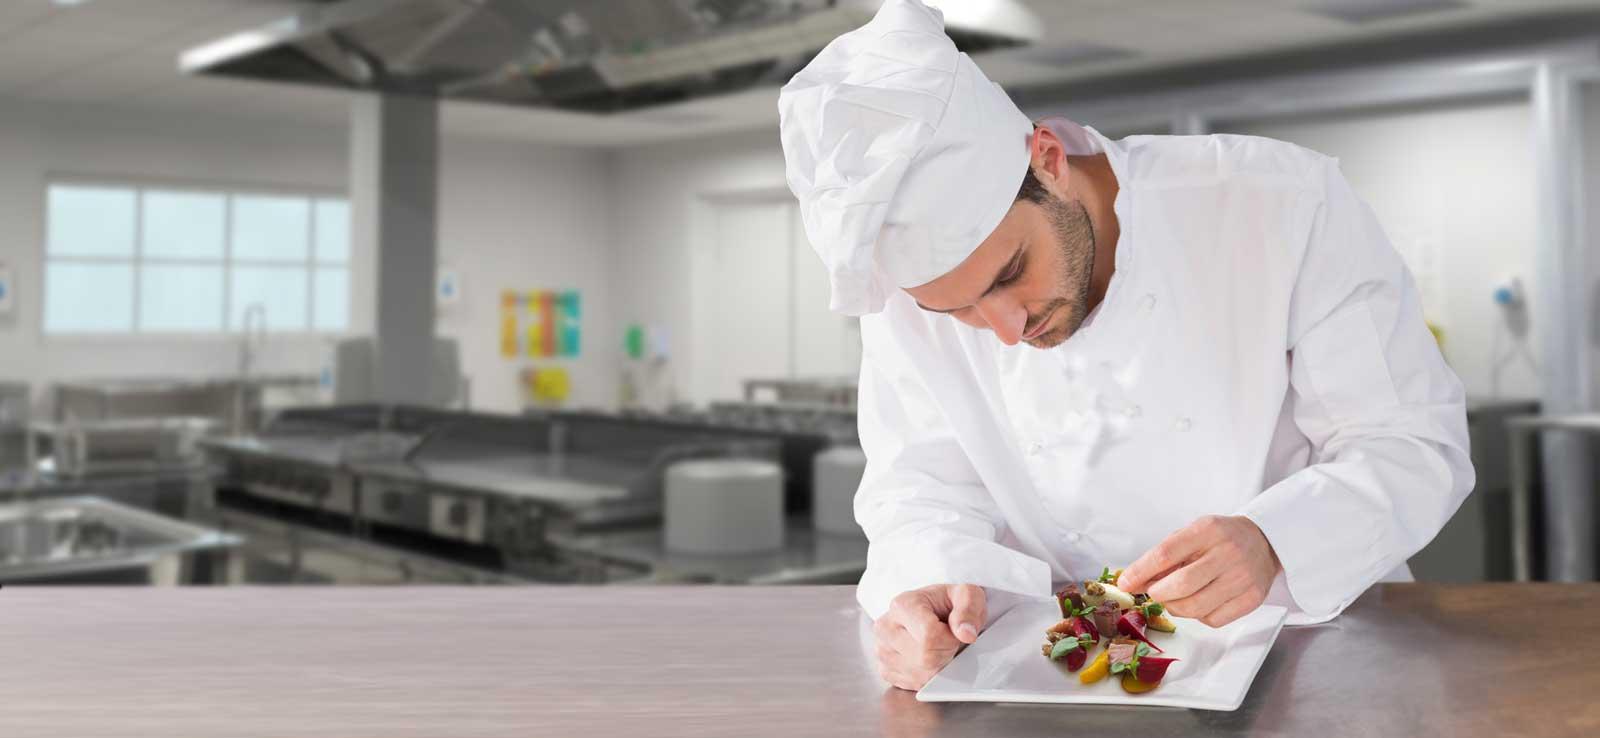 Gastronomía Professional Chef